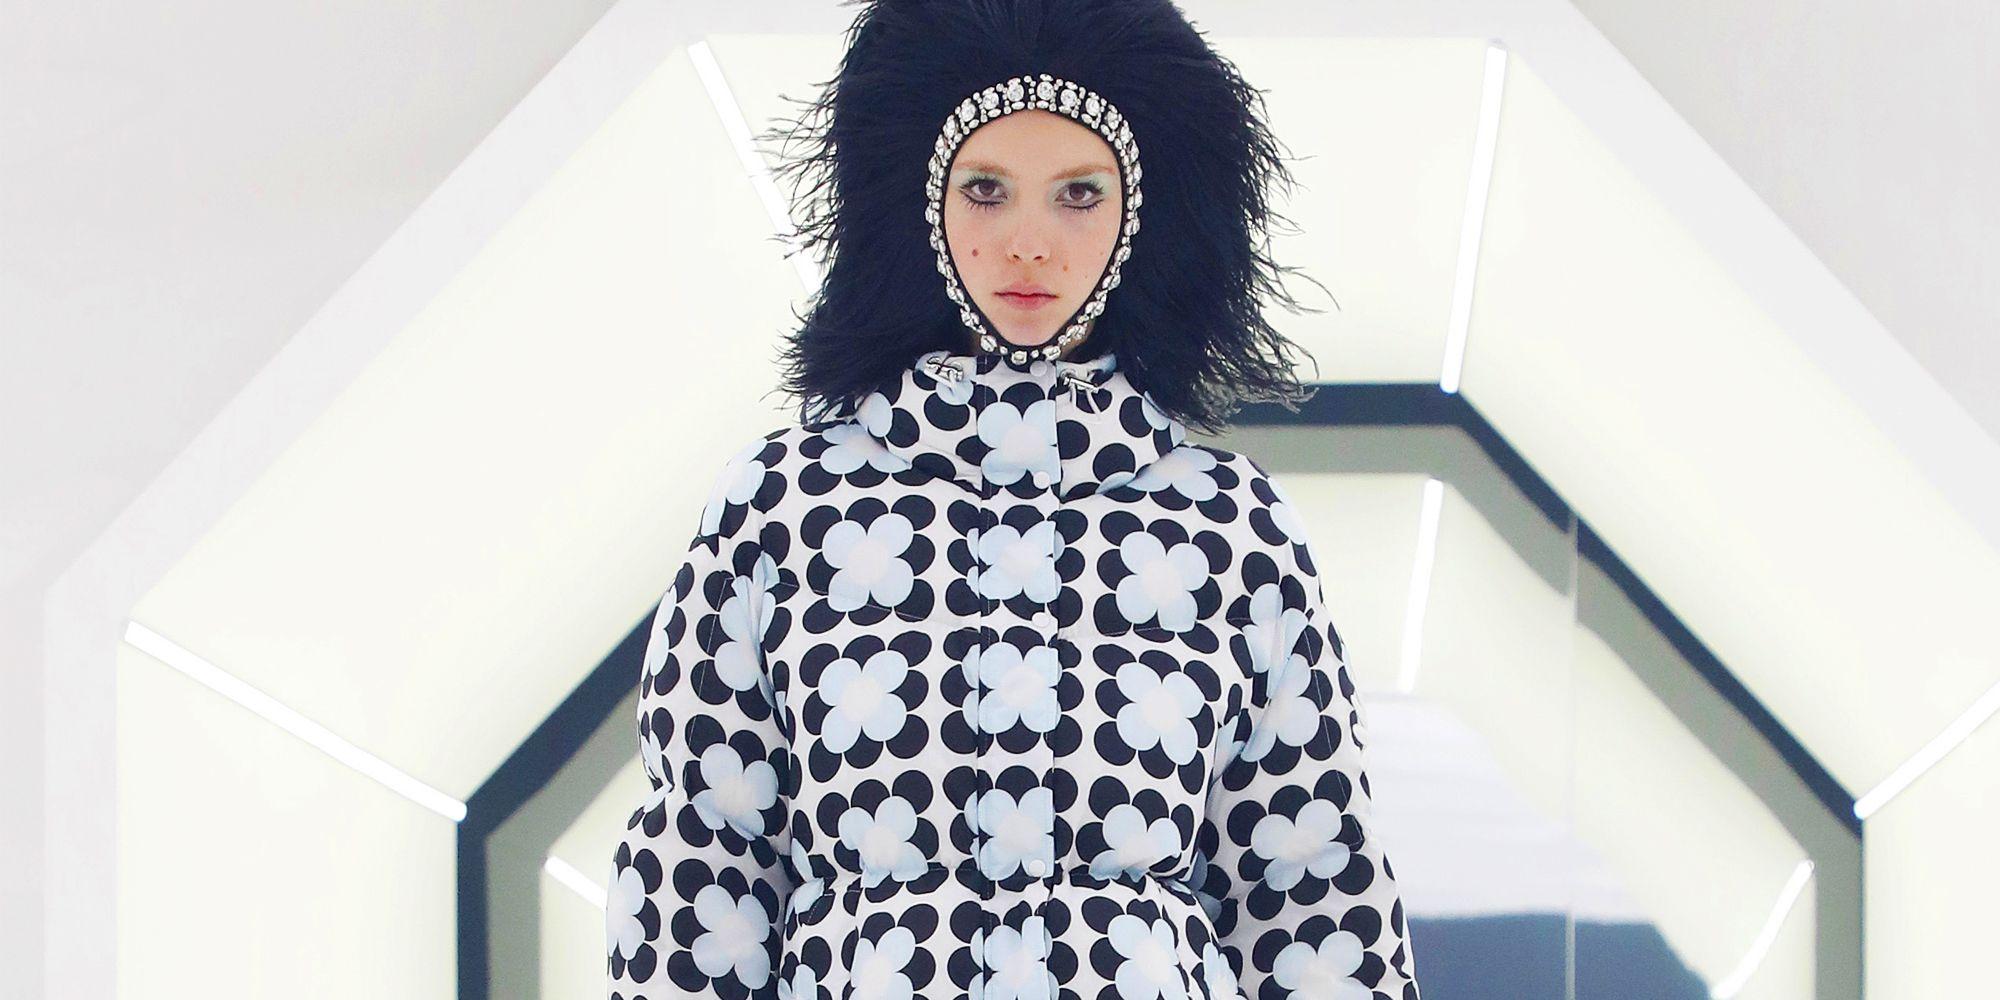 Piumini moda 2020 2021: Moncler Genius tendenza Autunno Inverno